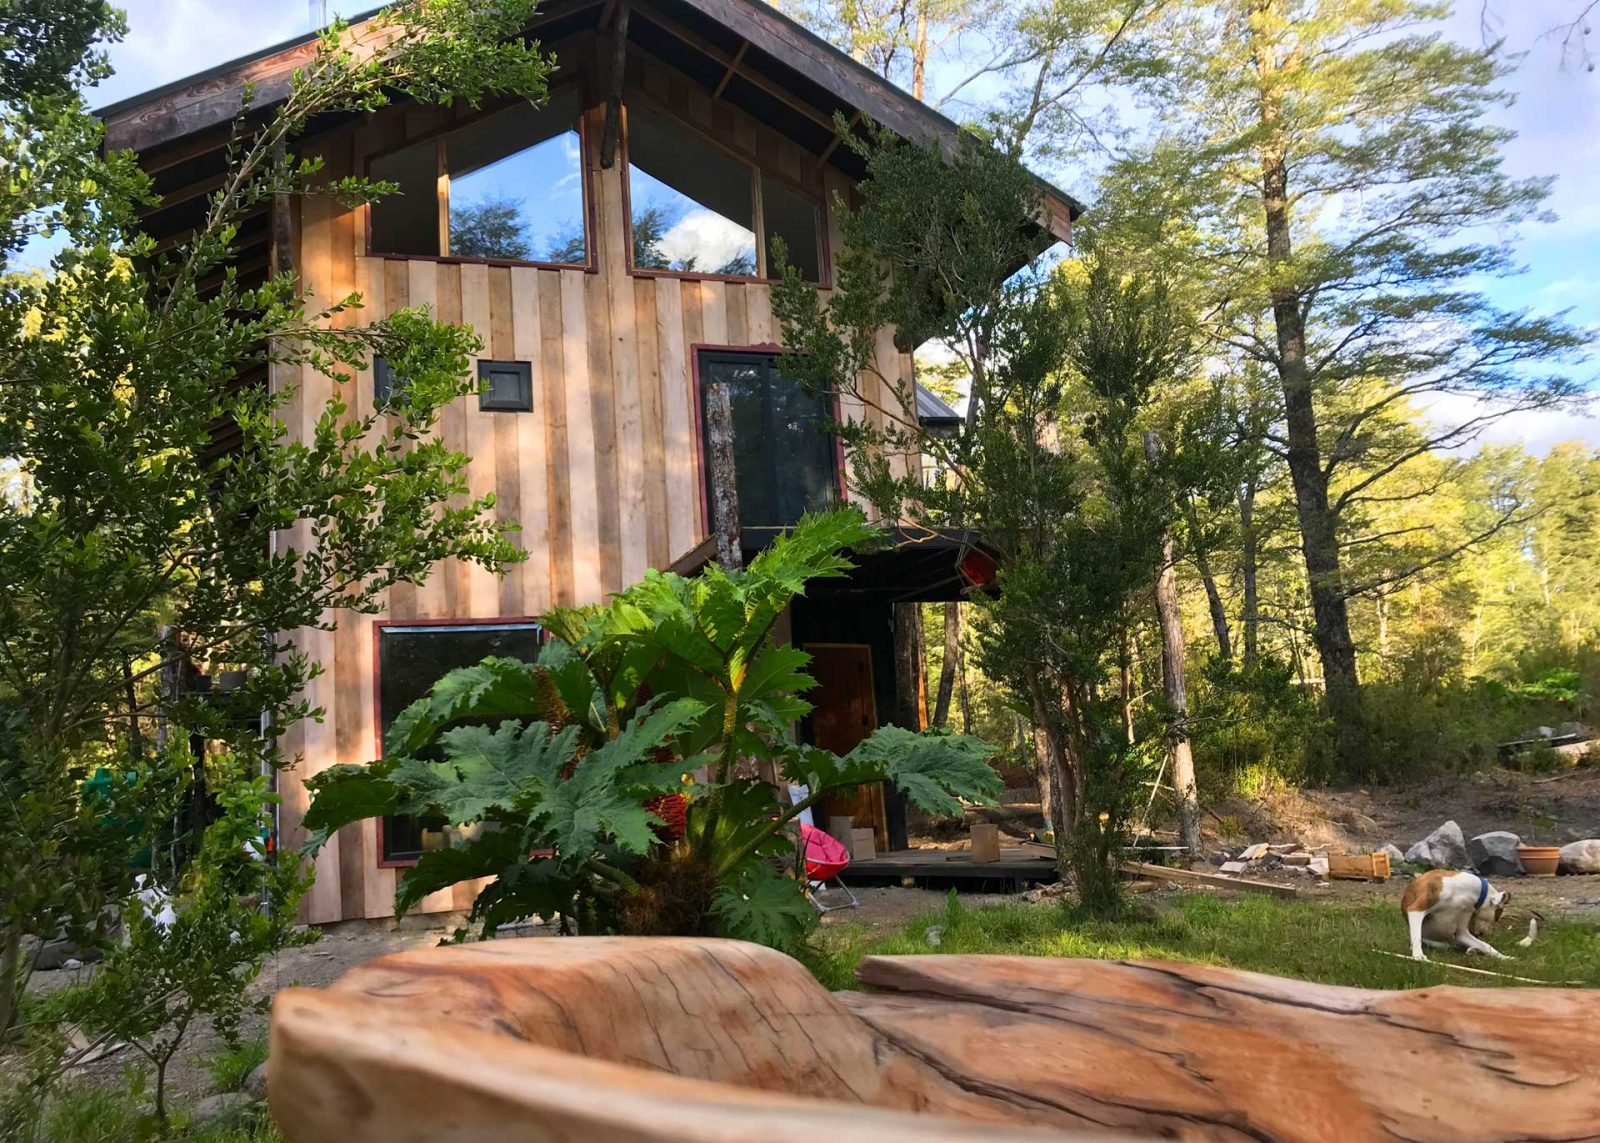 Casa Gioia Lodge, Ensenada. Patagonia, Chile